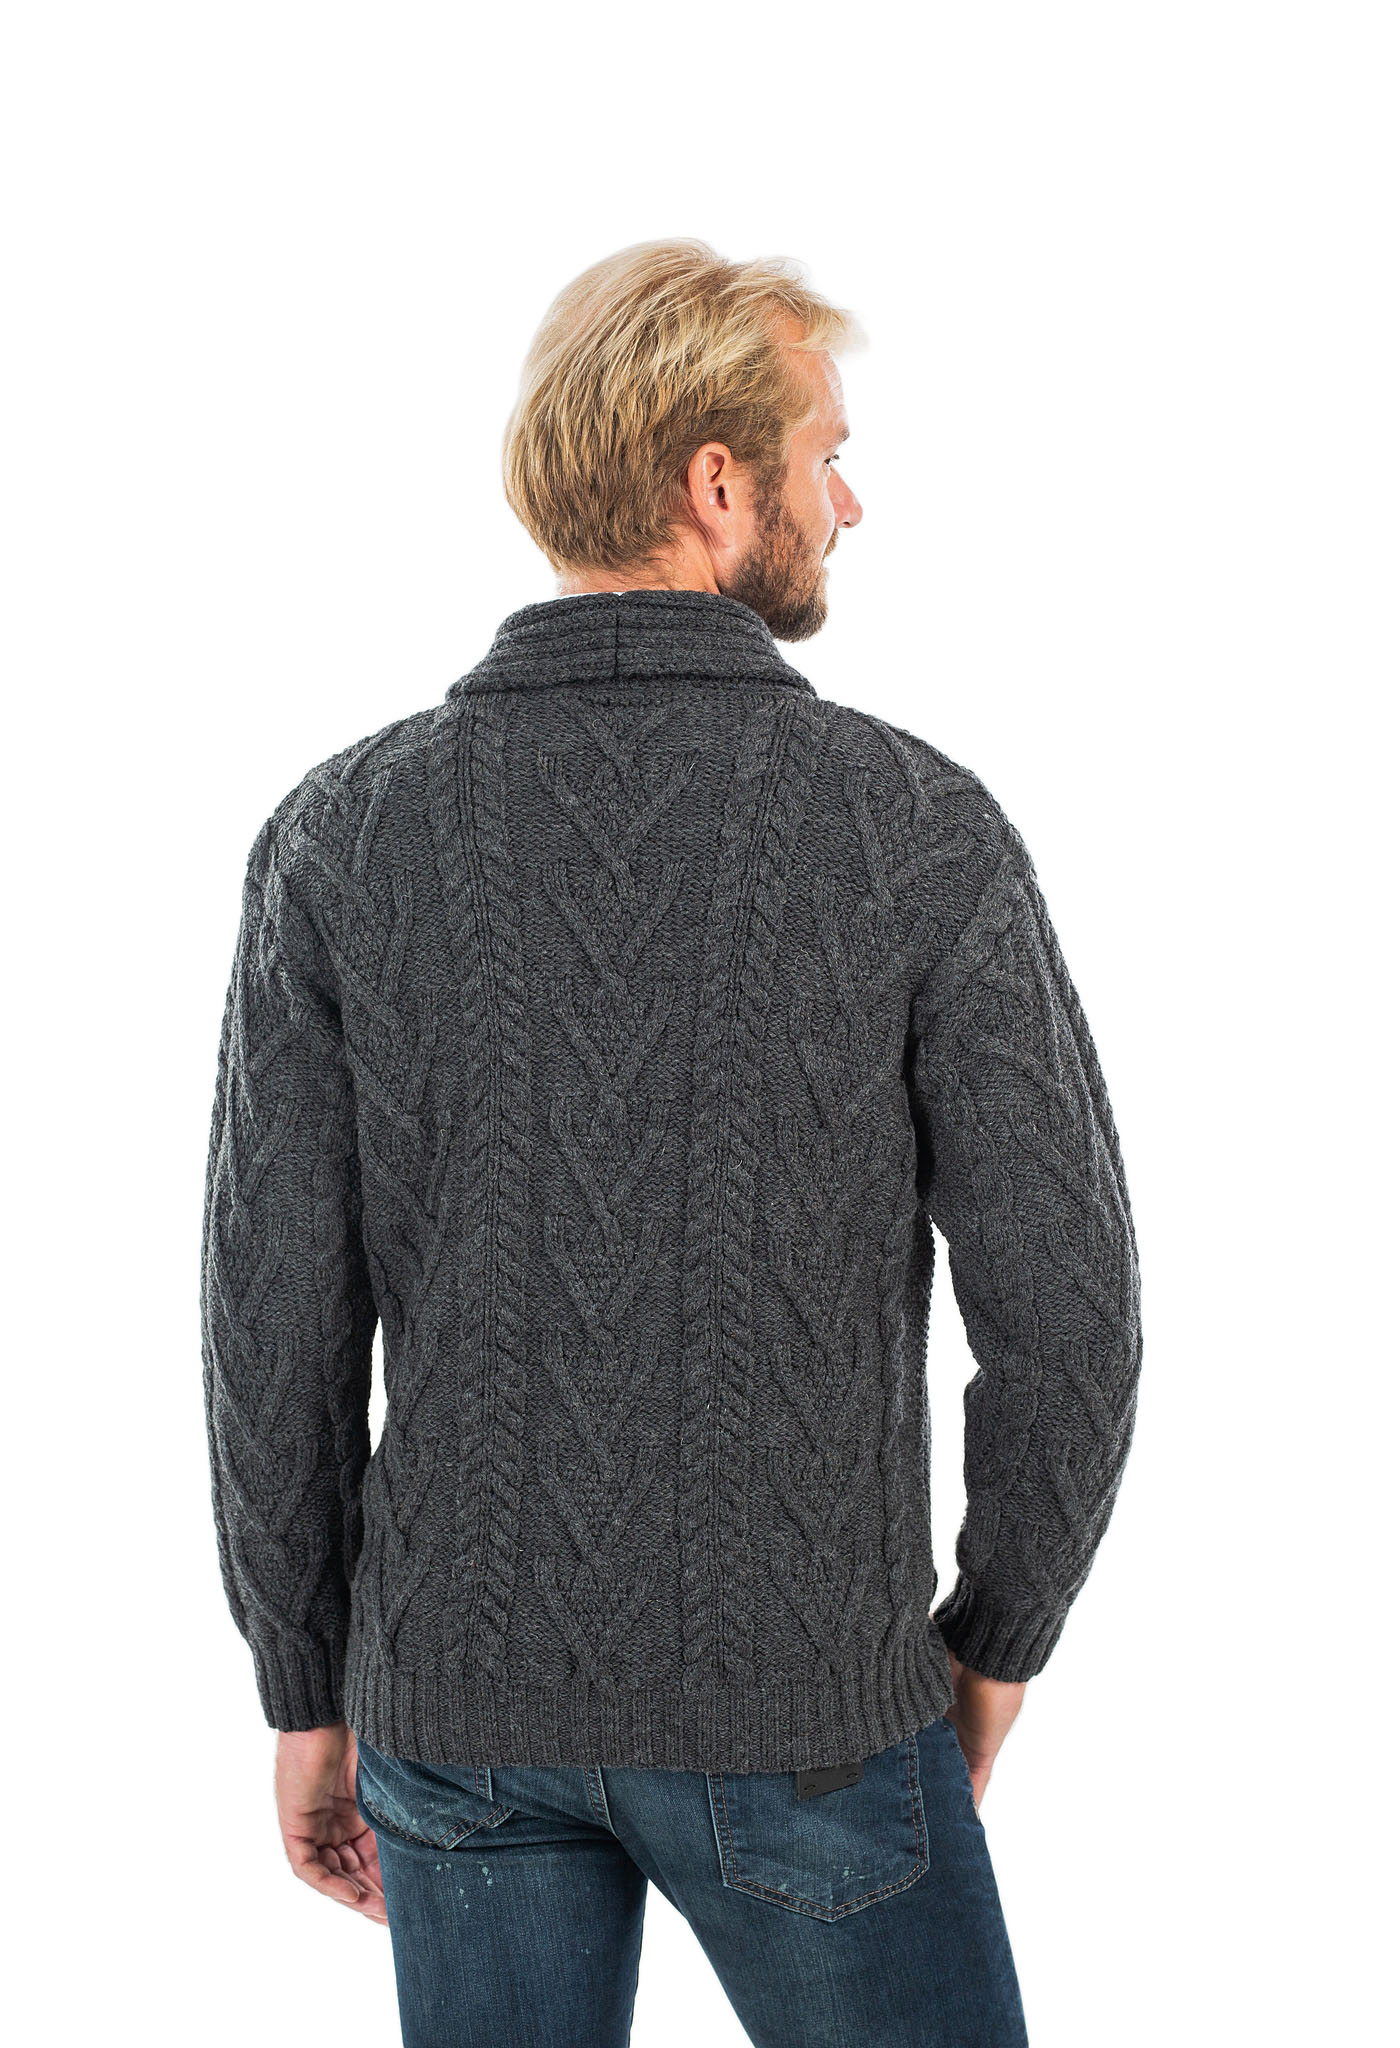 SAOL-Mens-Irish-Merino-Wool-Cardigan-Shawl-Collar-Front-Pockets-Aran-Cable-Knit thumbnail 39